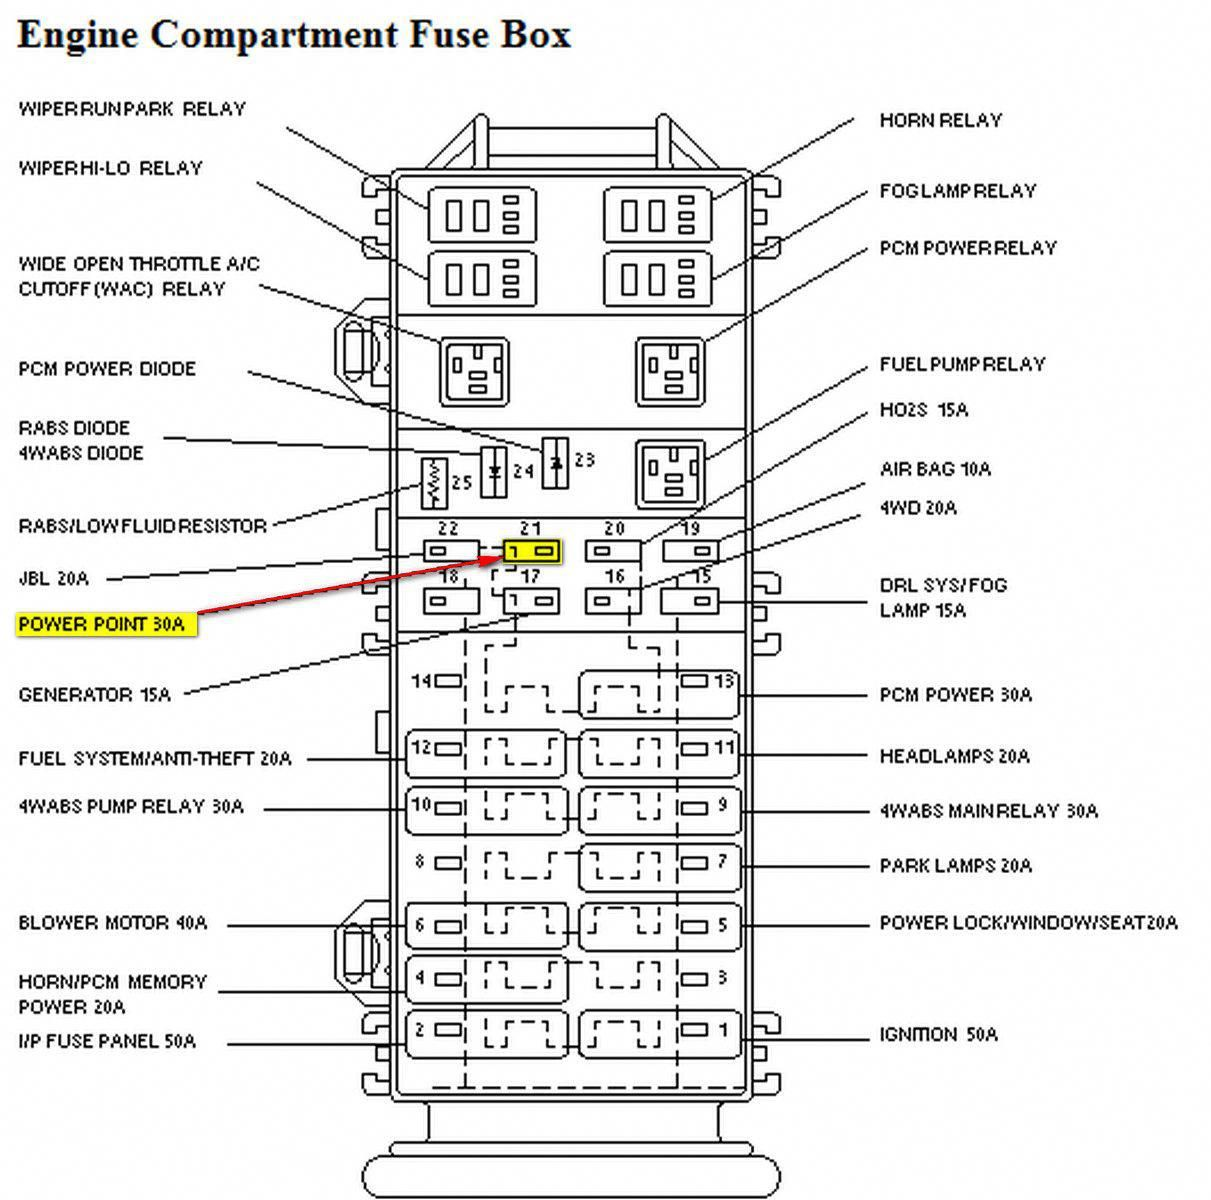 medium resolution of 1997 ford ranger fuse box diagram truck part diagrams